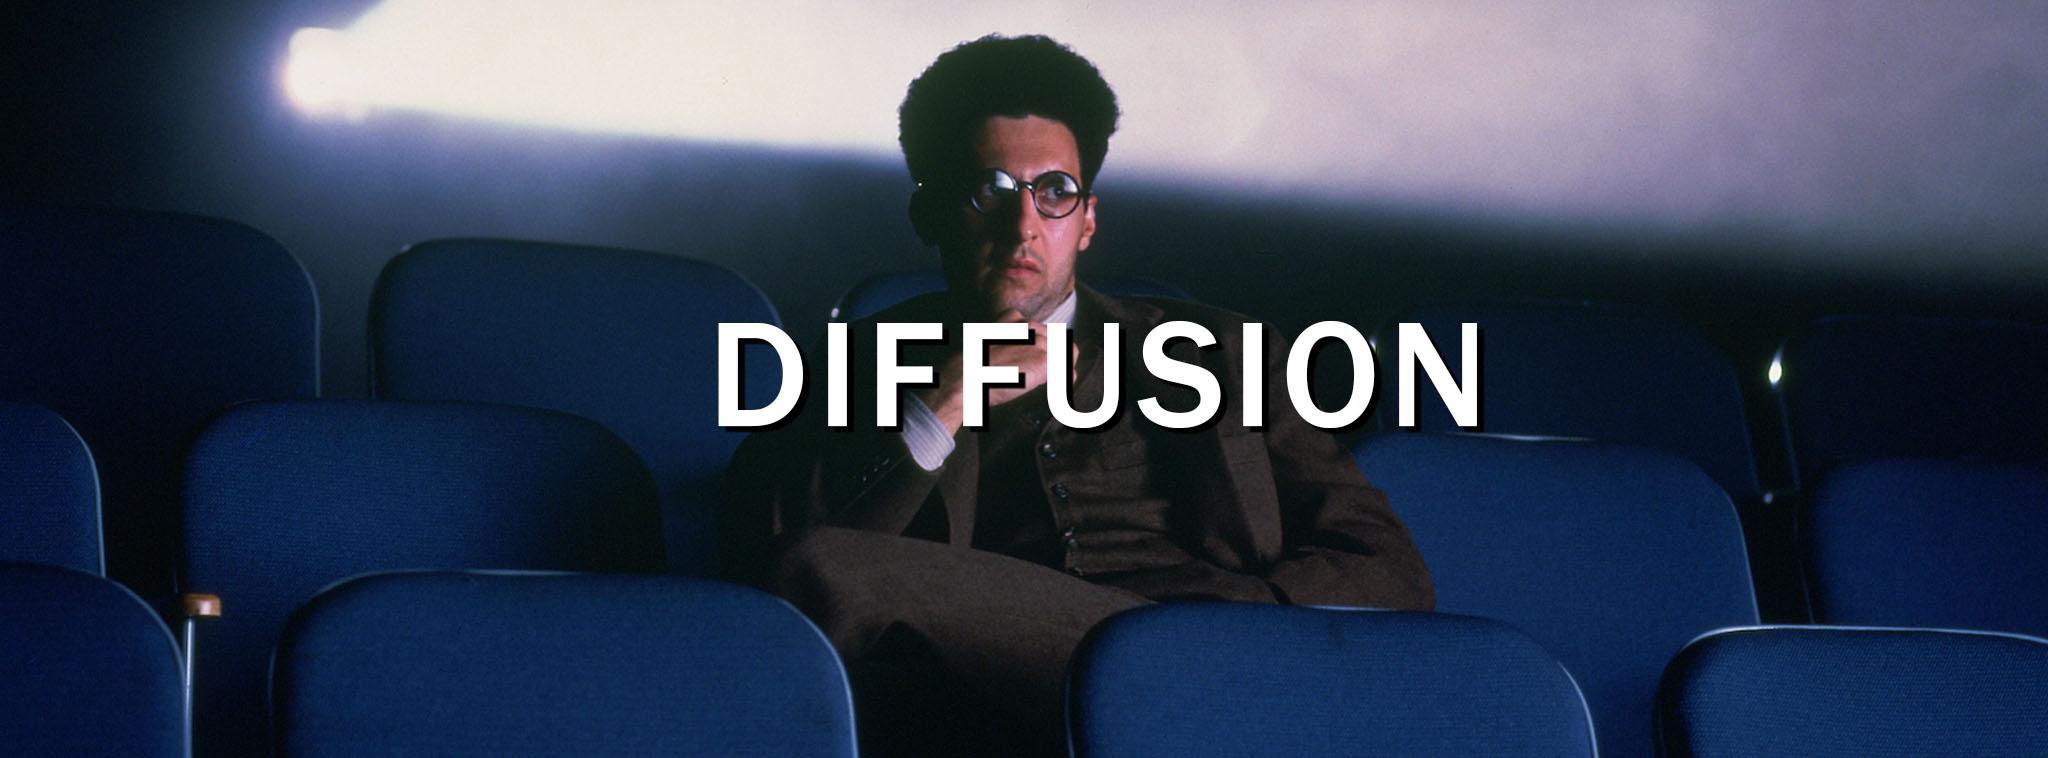 Diffusion actus DAN